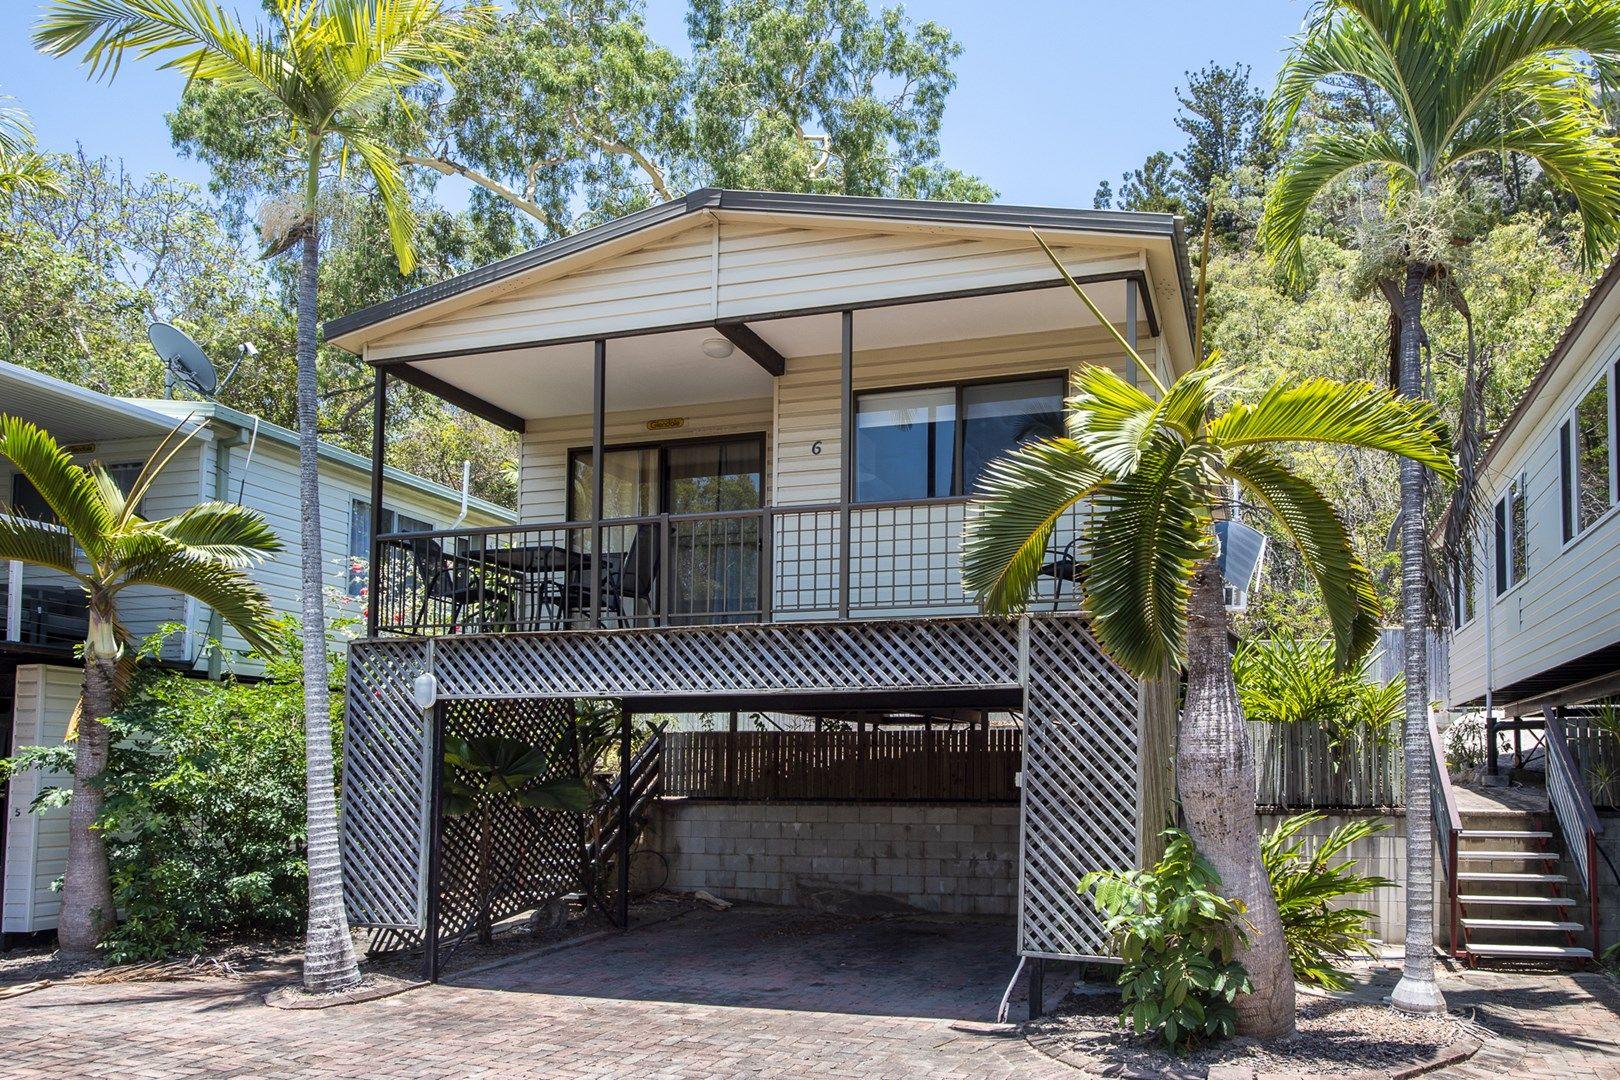 6/7-9 Rheuben Terrace, Arcadia QLD 4819, Image 0